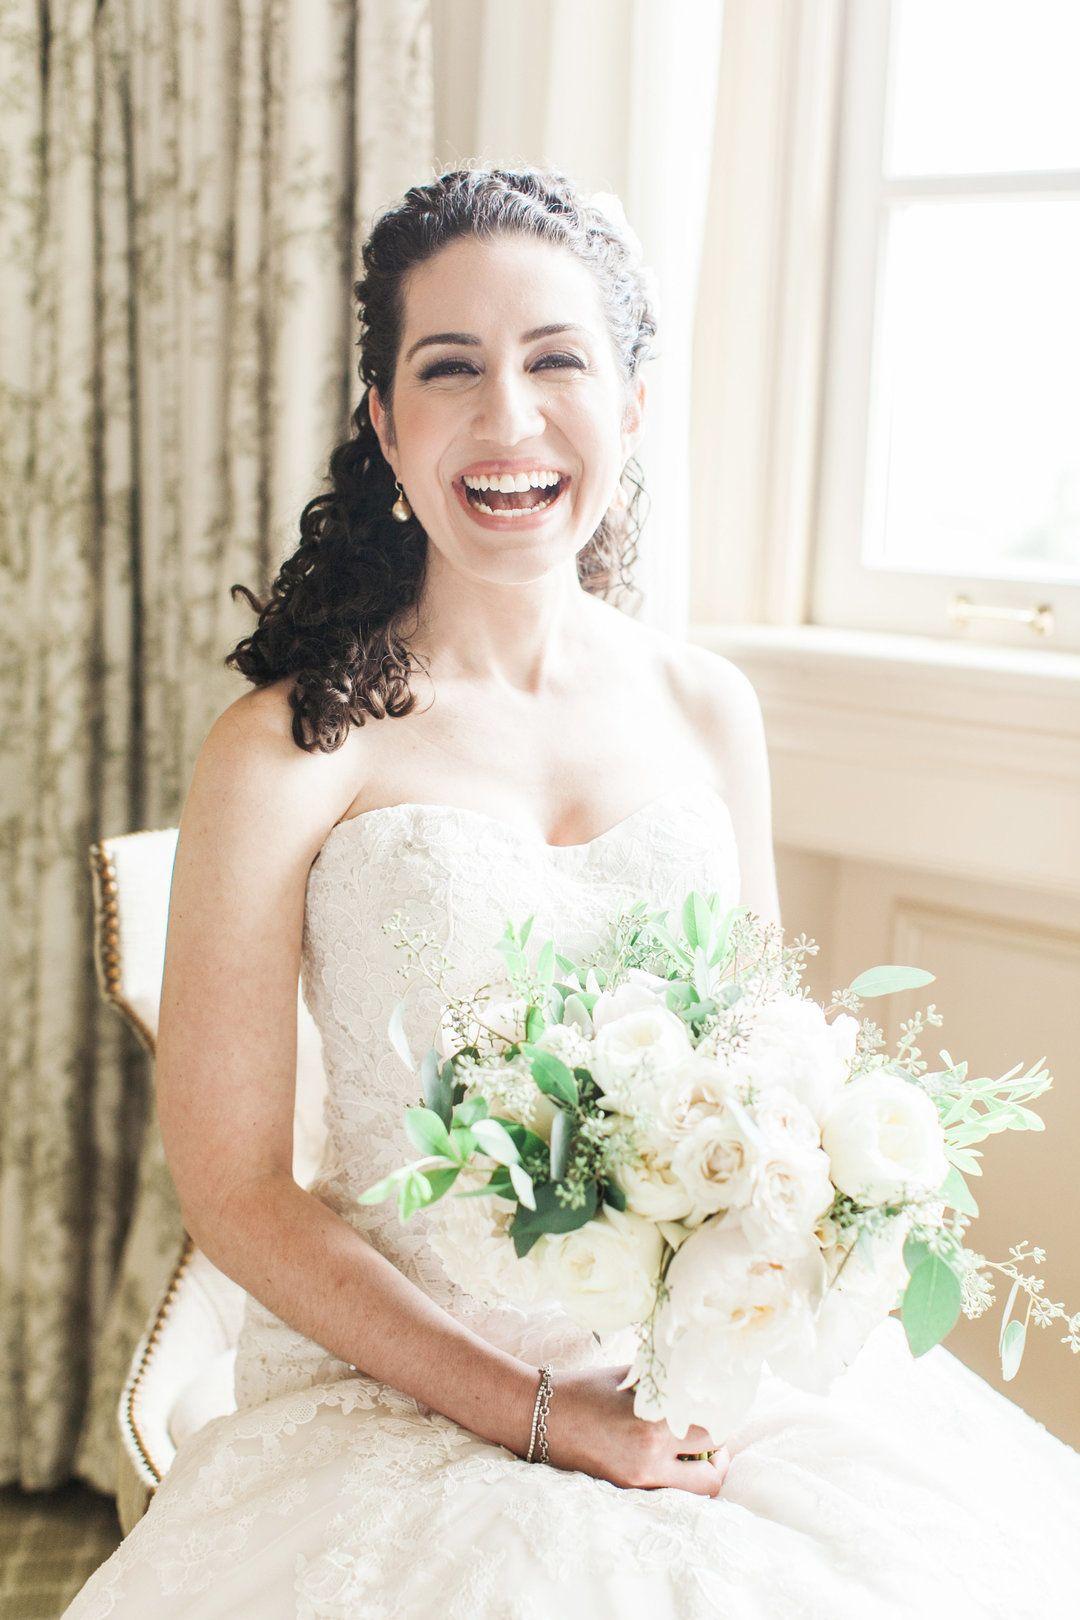 300+ Best Weddings & Celebrations images | wedding, celebrity weddings,  personalized matchbooks